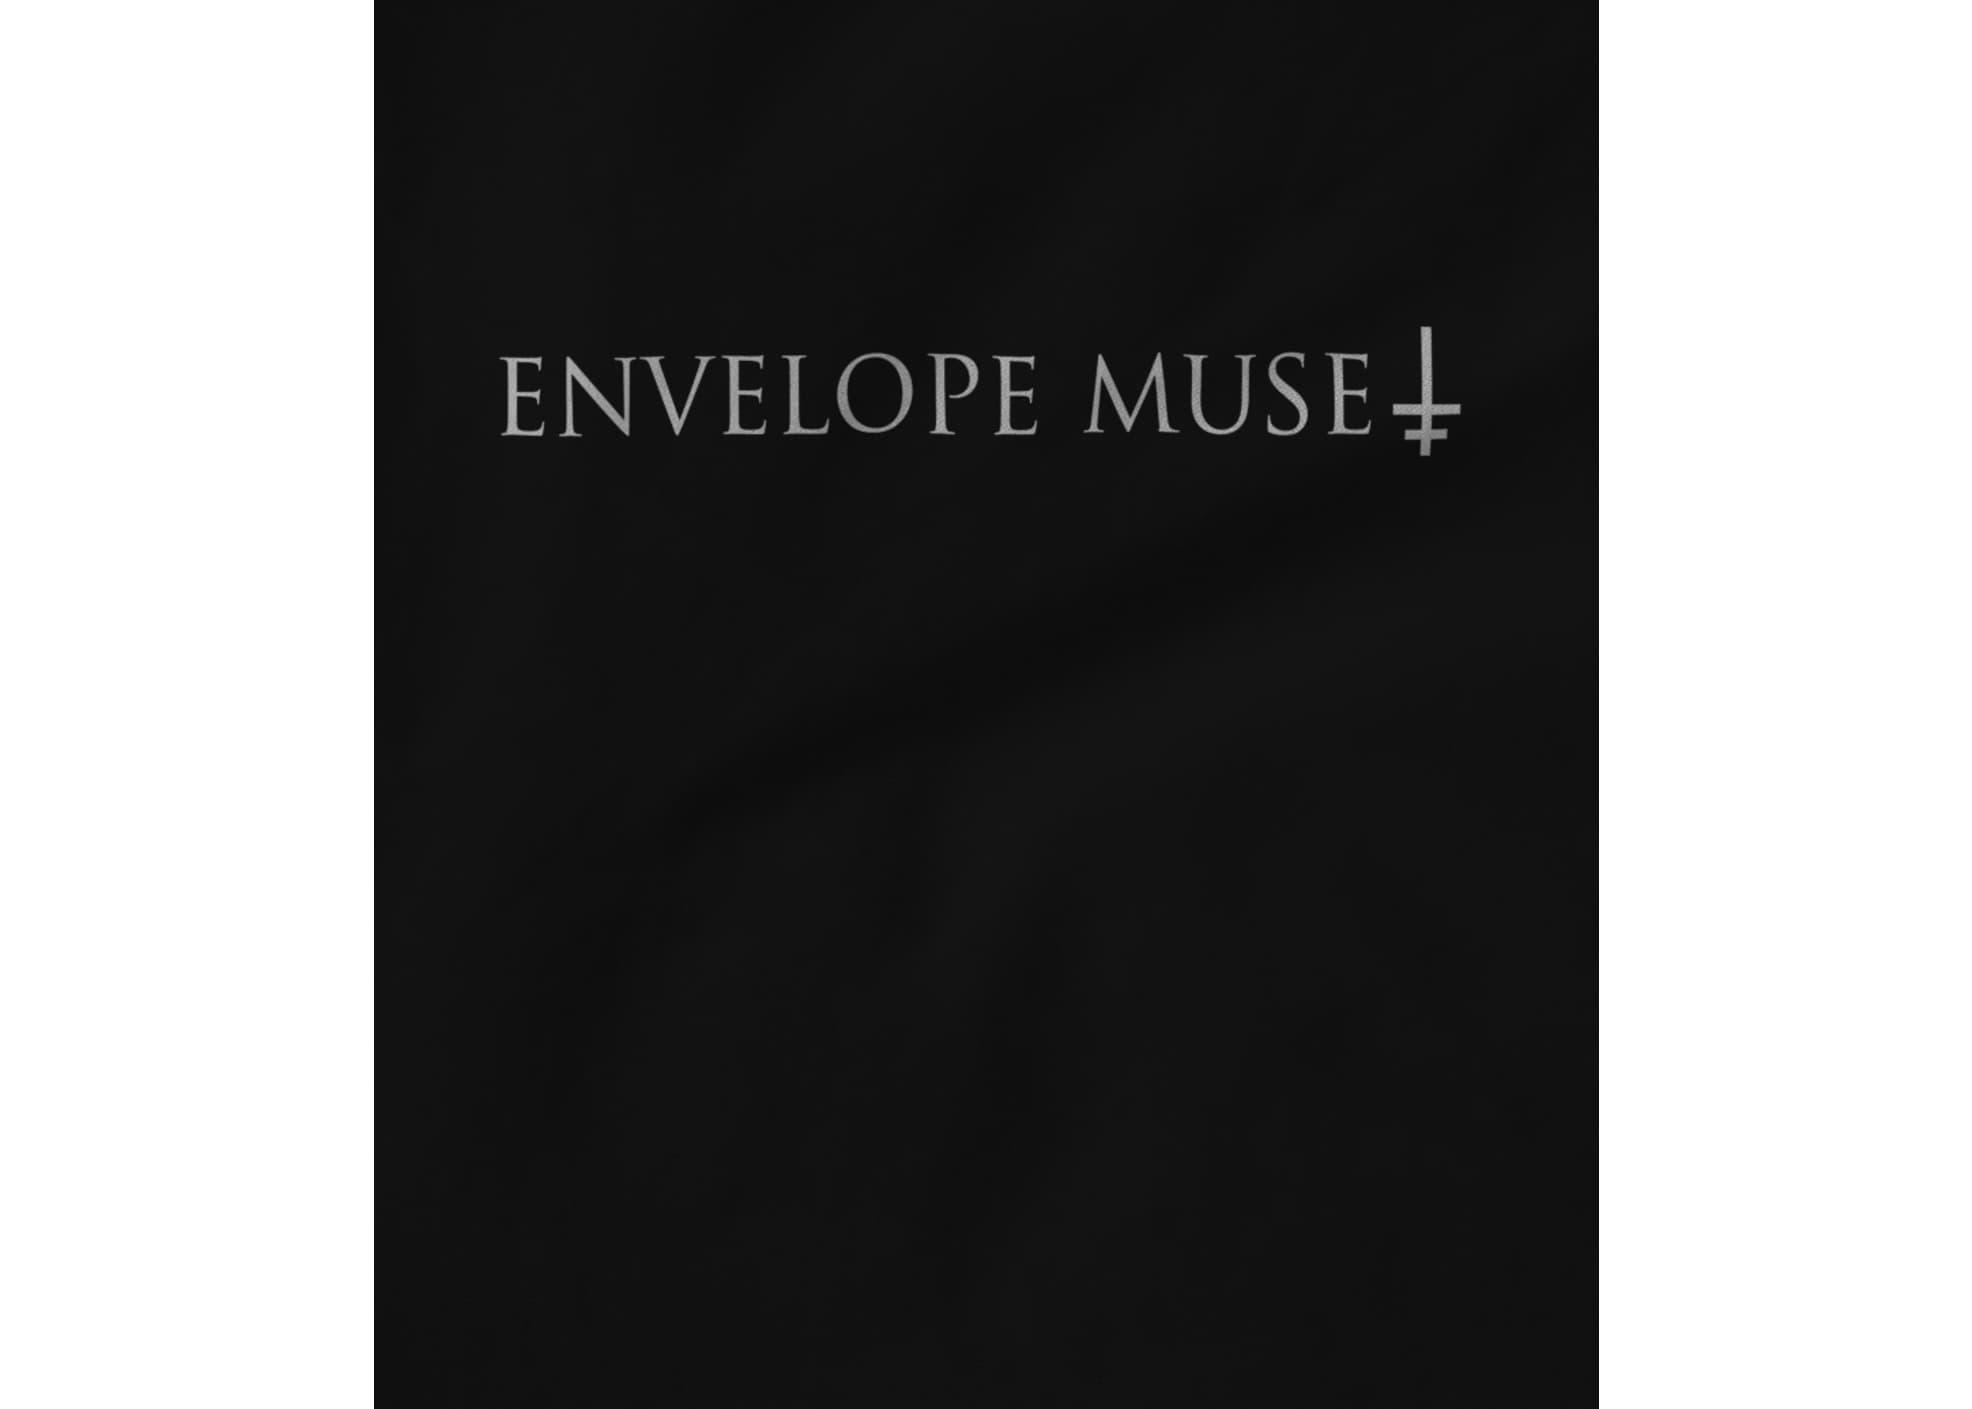 Envelope muse  protection   balance 1631081996